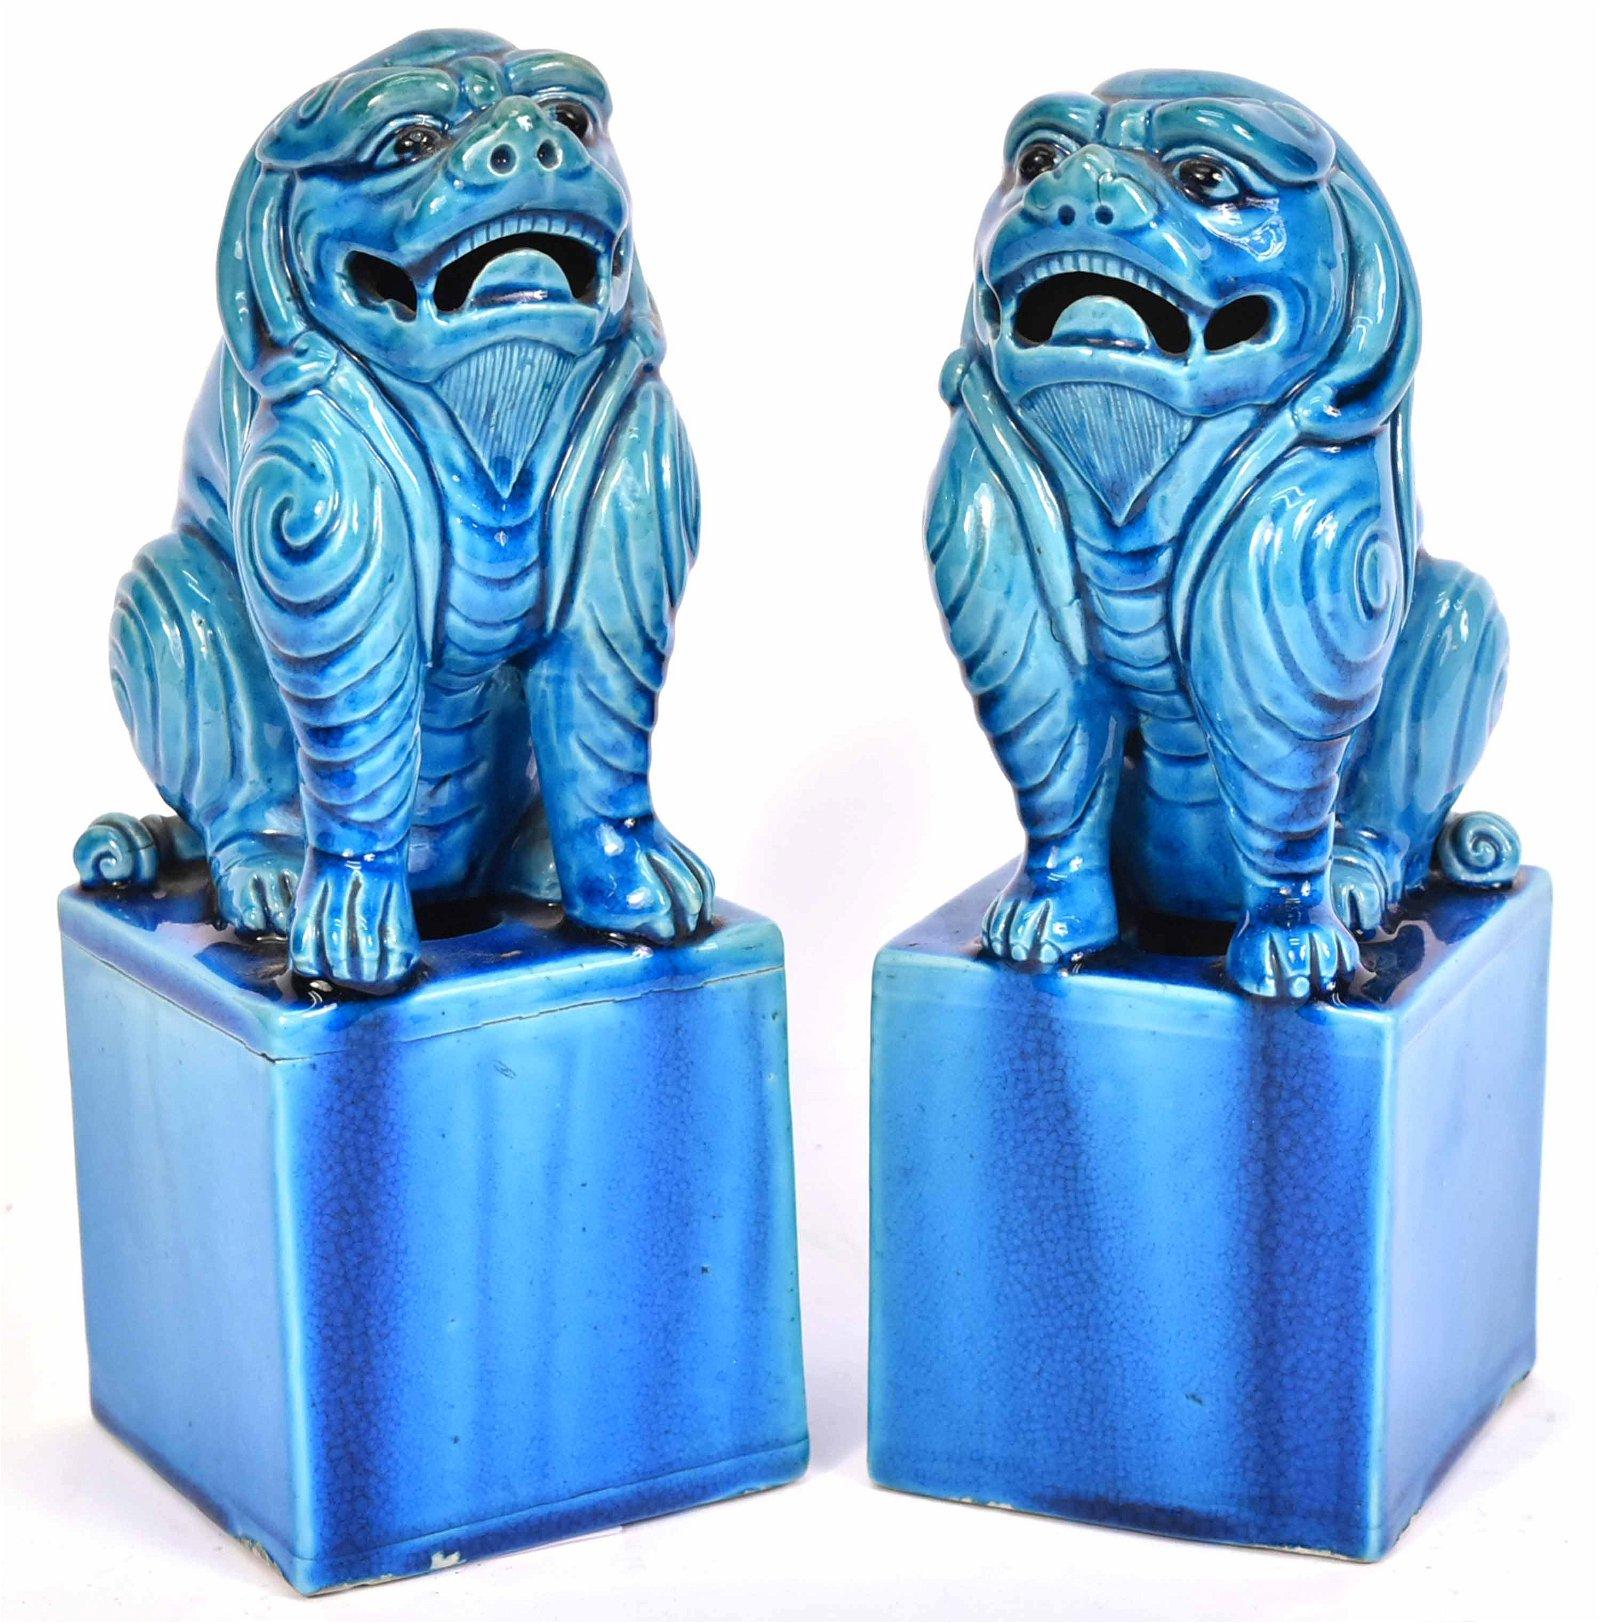 Pair of Chinese Blue-Glazed Ceramic Fu Dogs